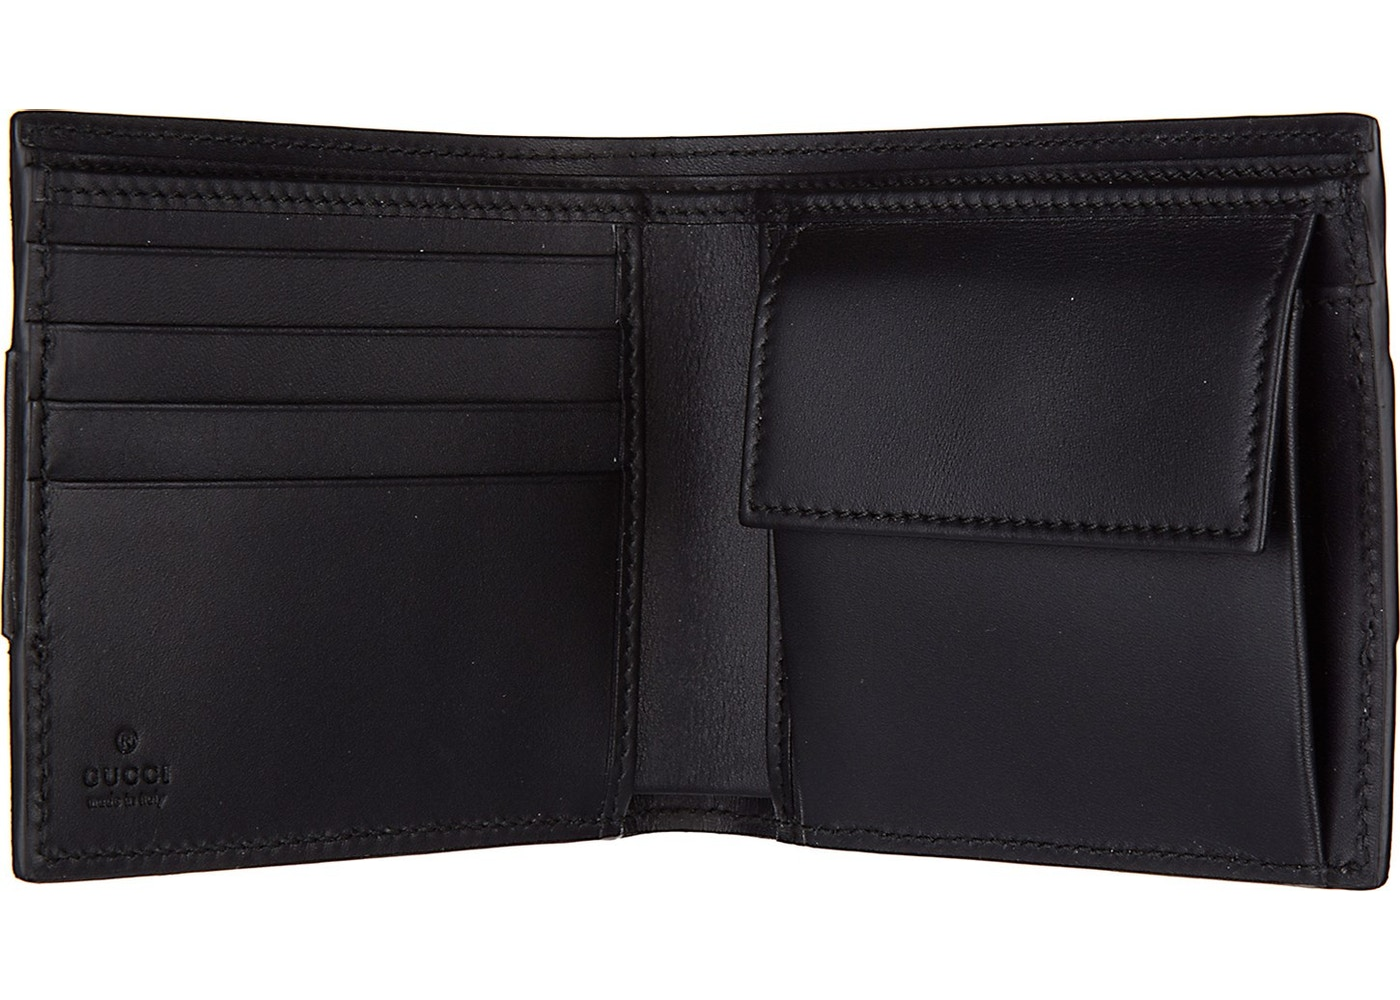 92b664173446a3 Gucci Coin Pouch Bifold Wallet Signature Web Stripe Black